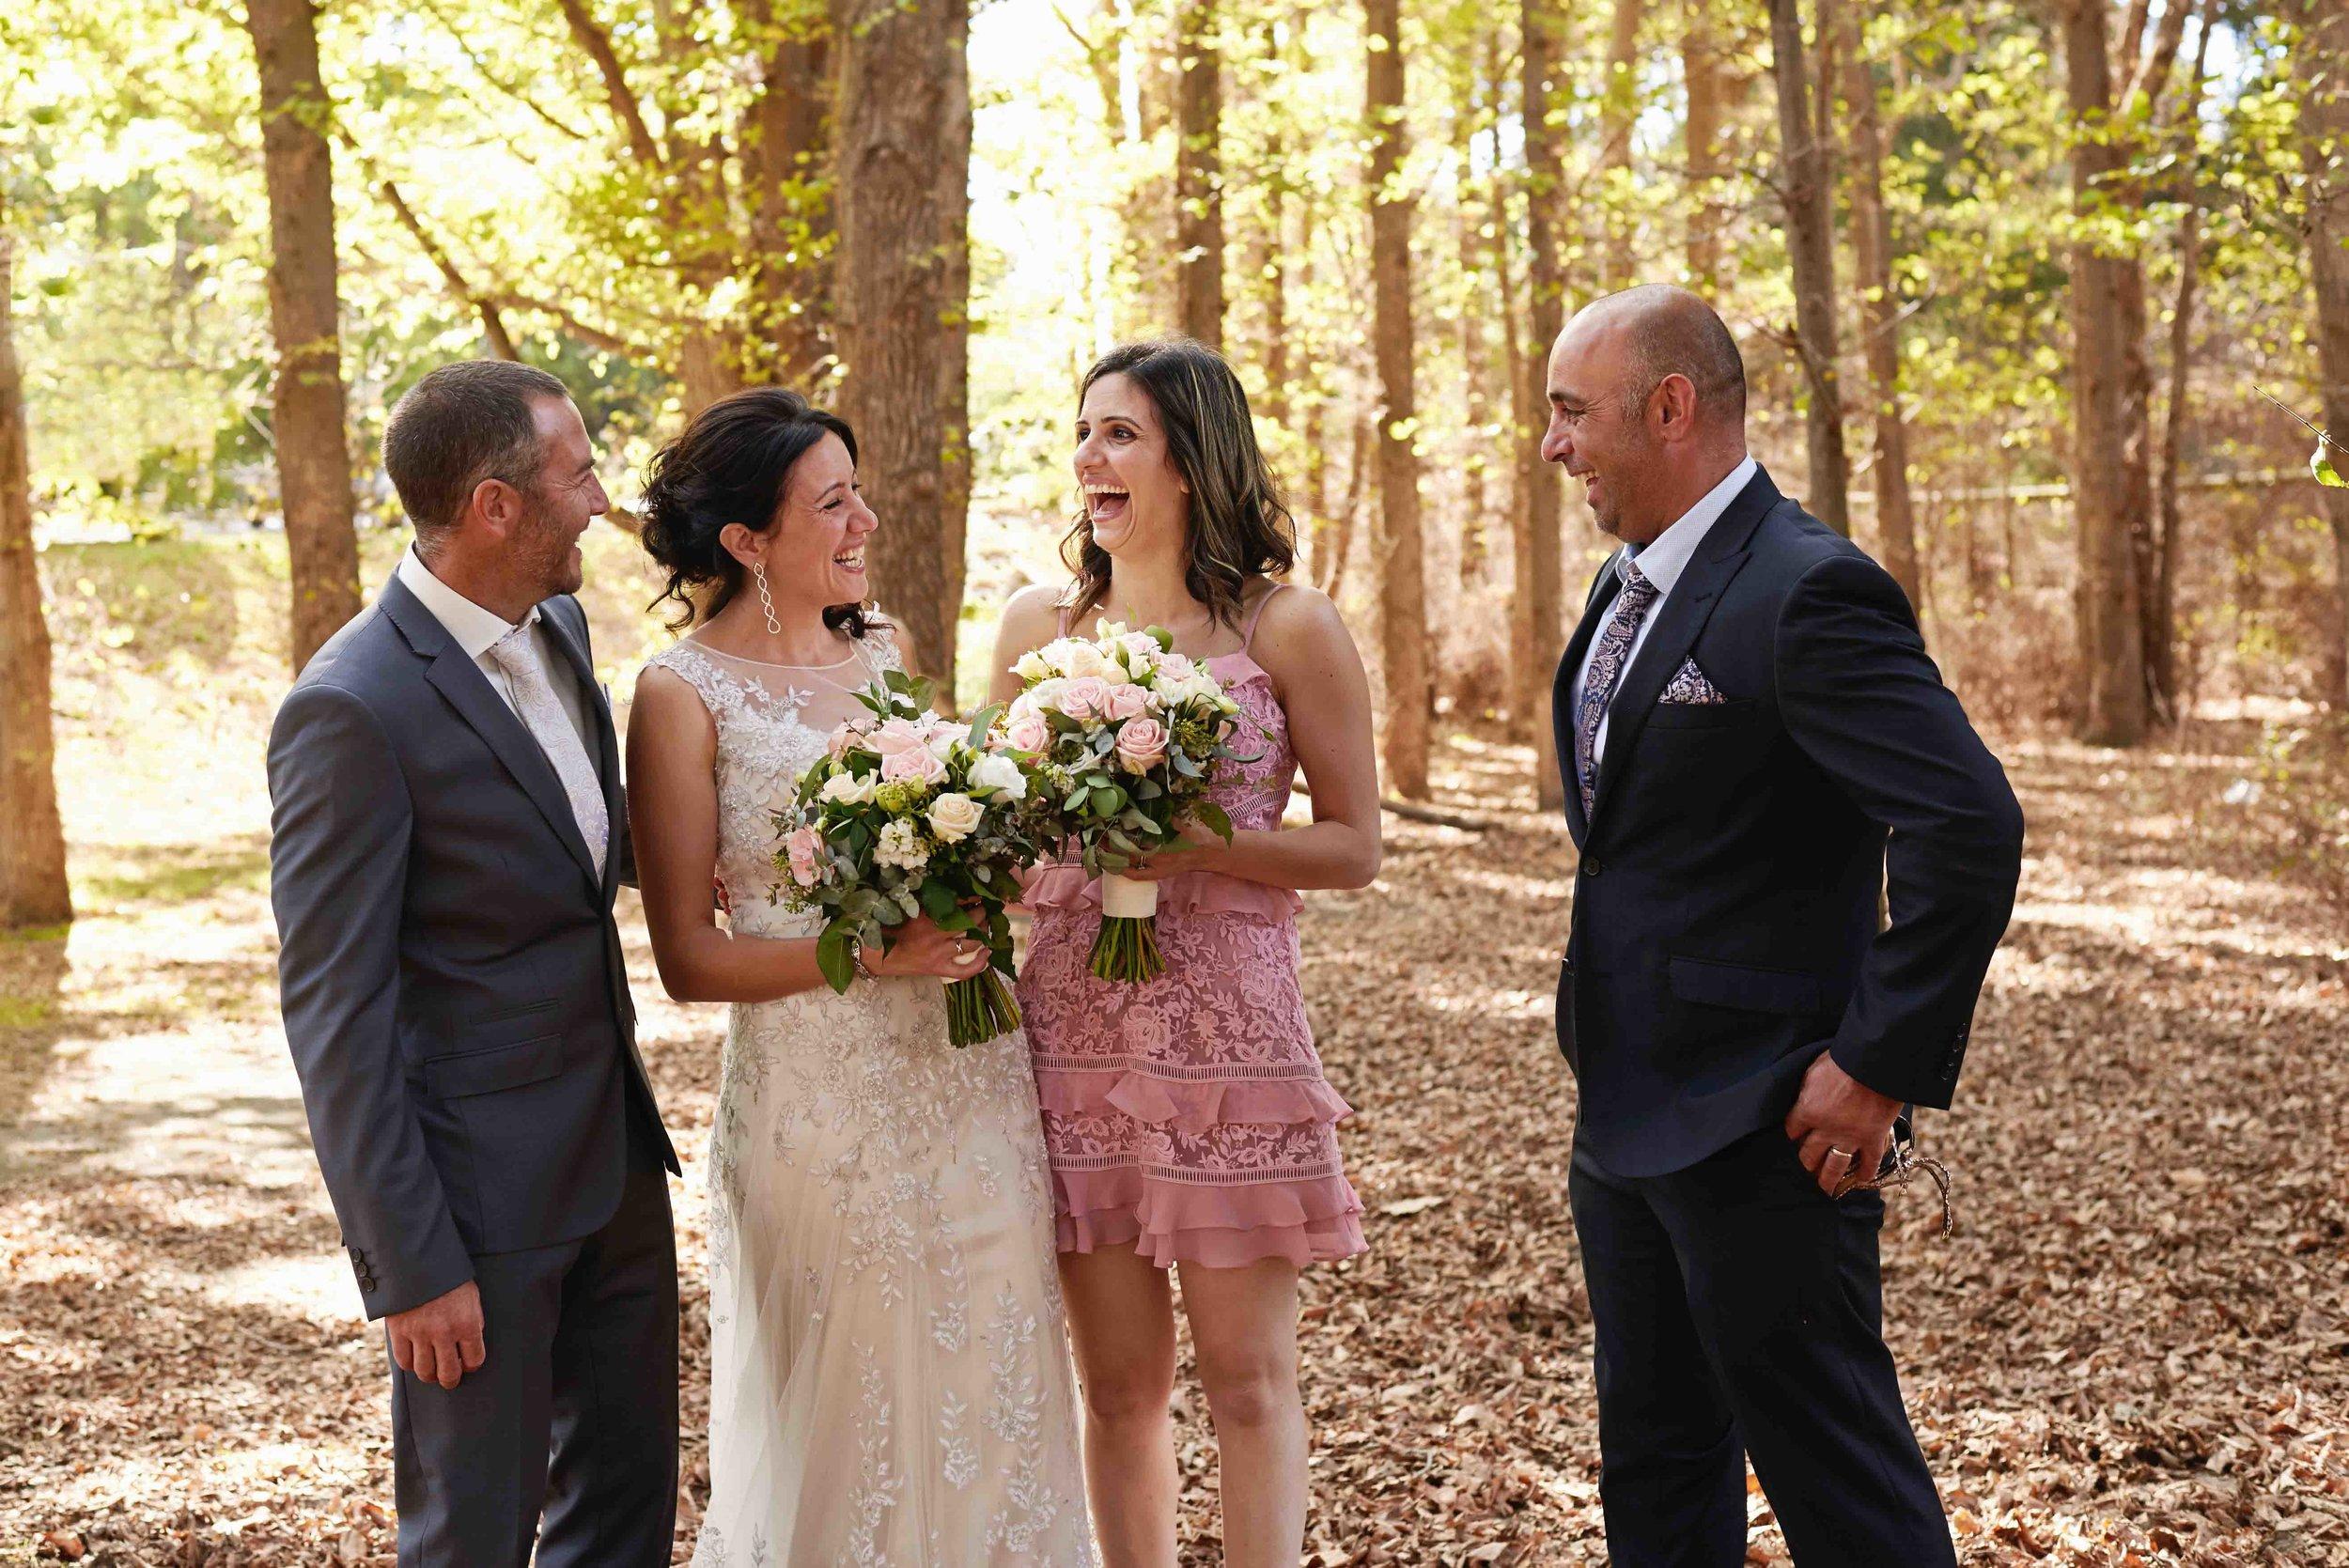 sorrento-wedding-photography-all-smiles-marissa-jade-photography-149.jpg